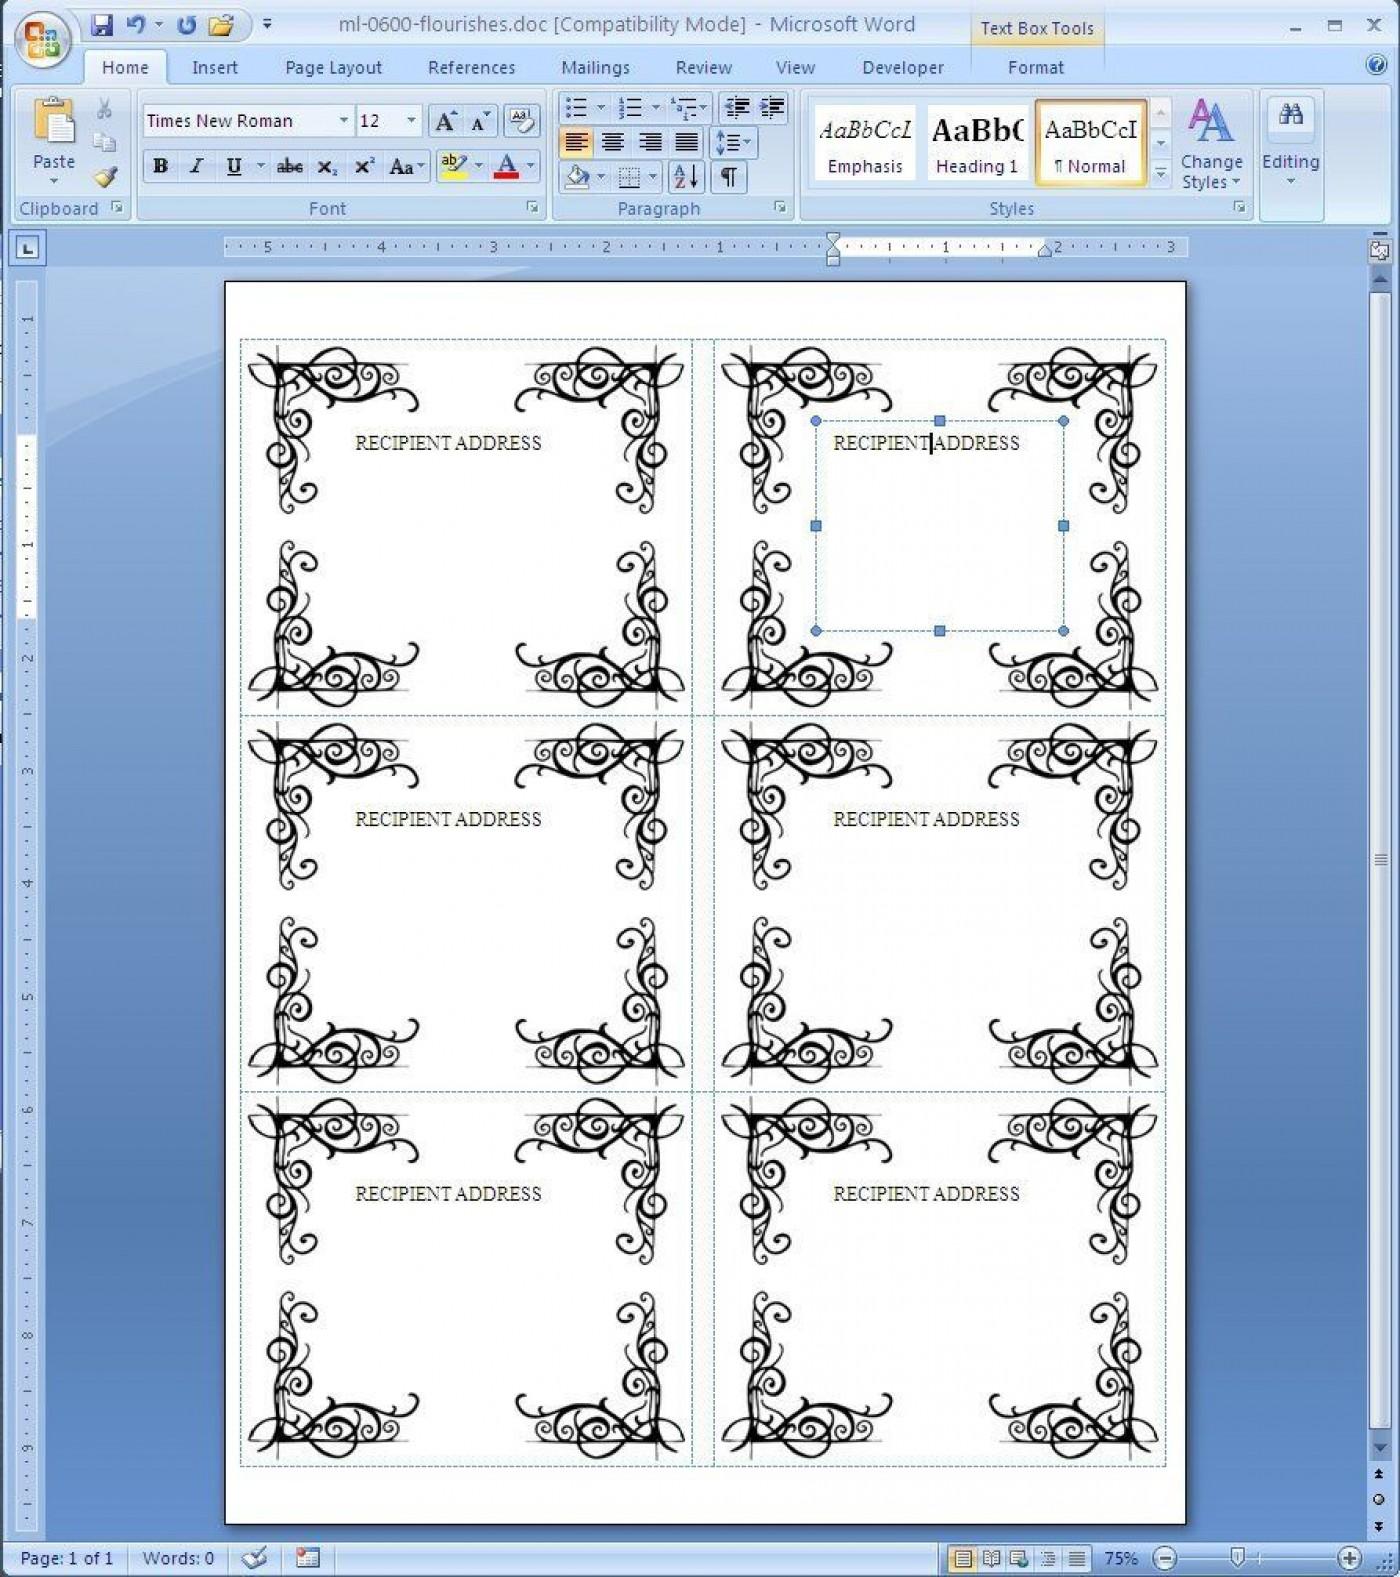 000 Fantastic Microsoft Word Addres Label Template Free Photo  Cd Dvd Christma1400